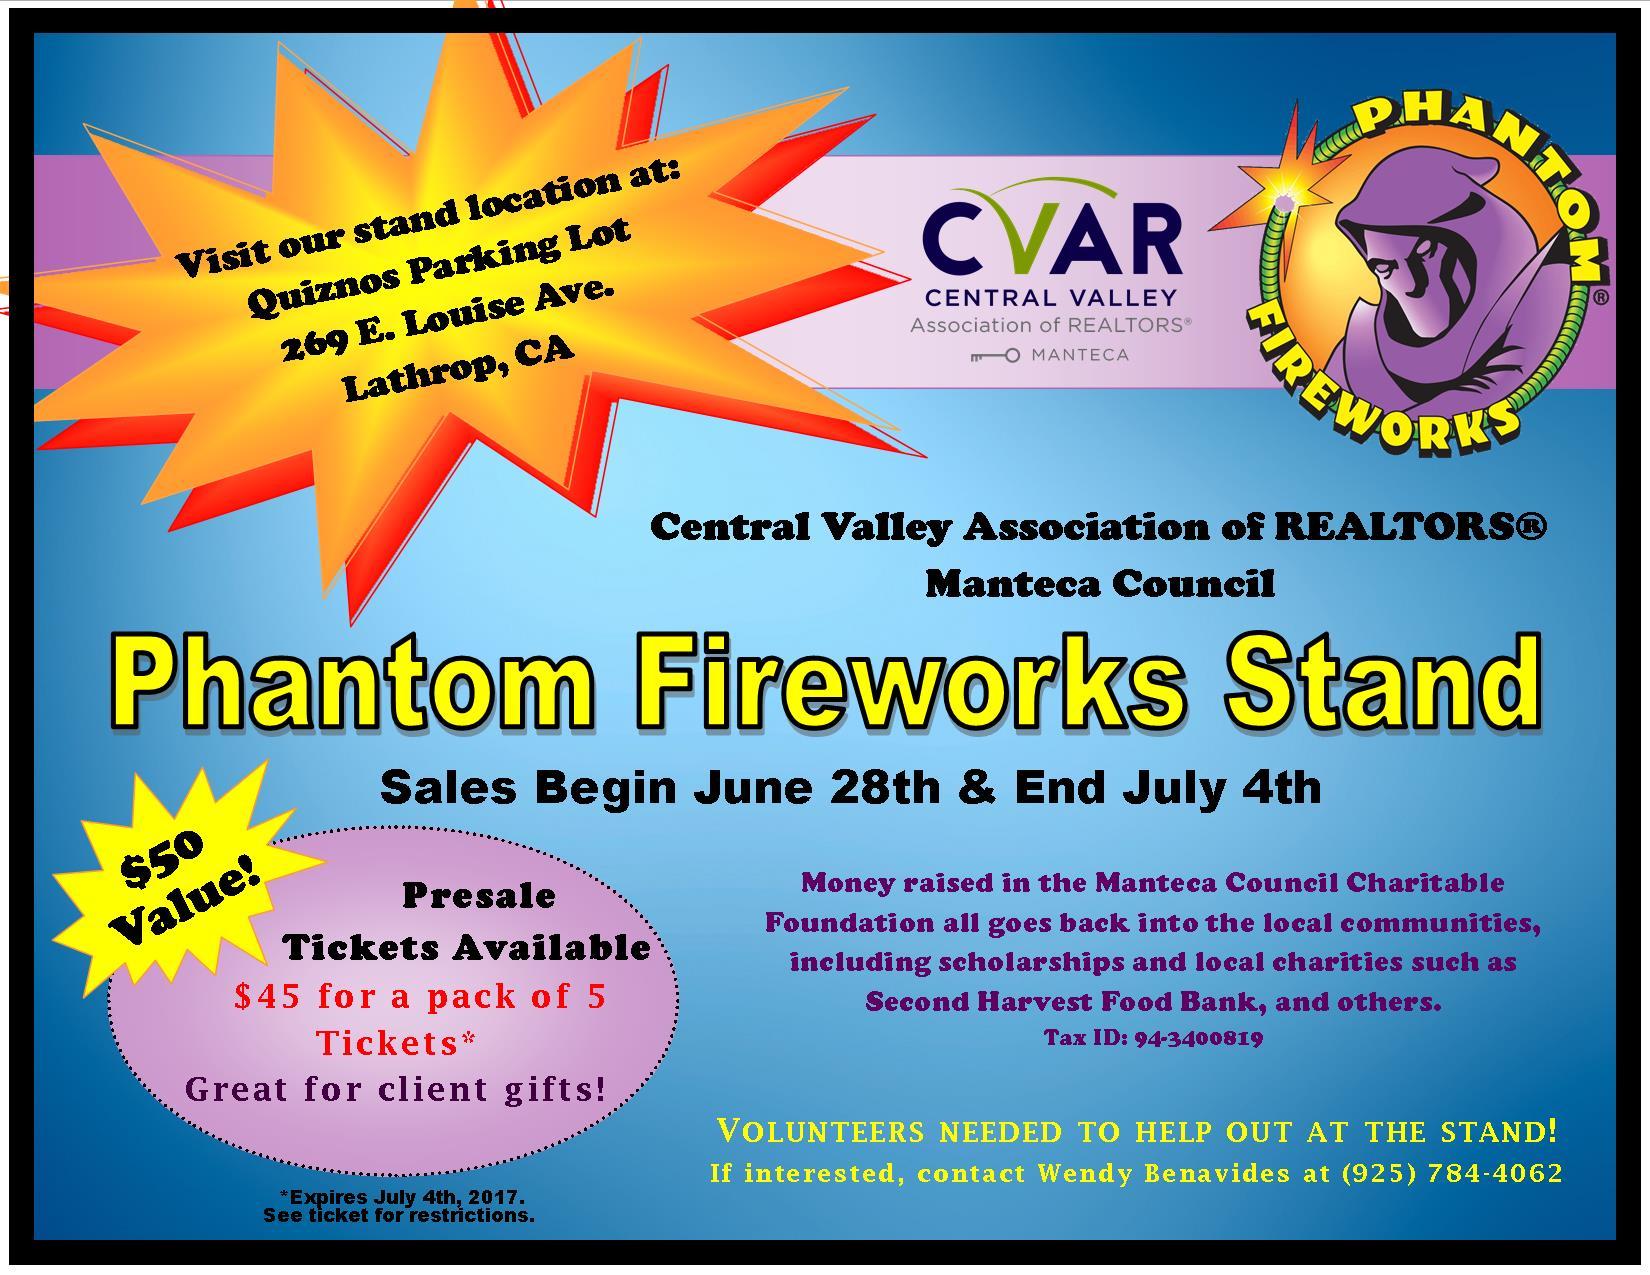 CVAR Manteca Council Phantom Fireworks Stand @ Quiznos Parking Lot | Lathrop | California | United States